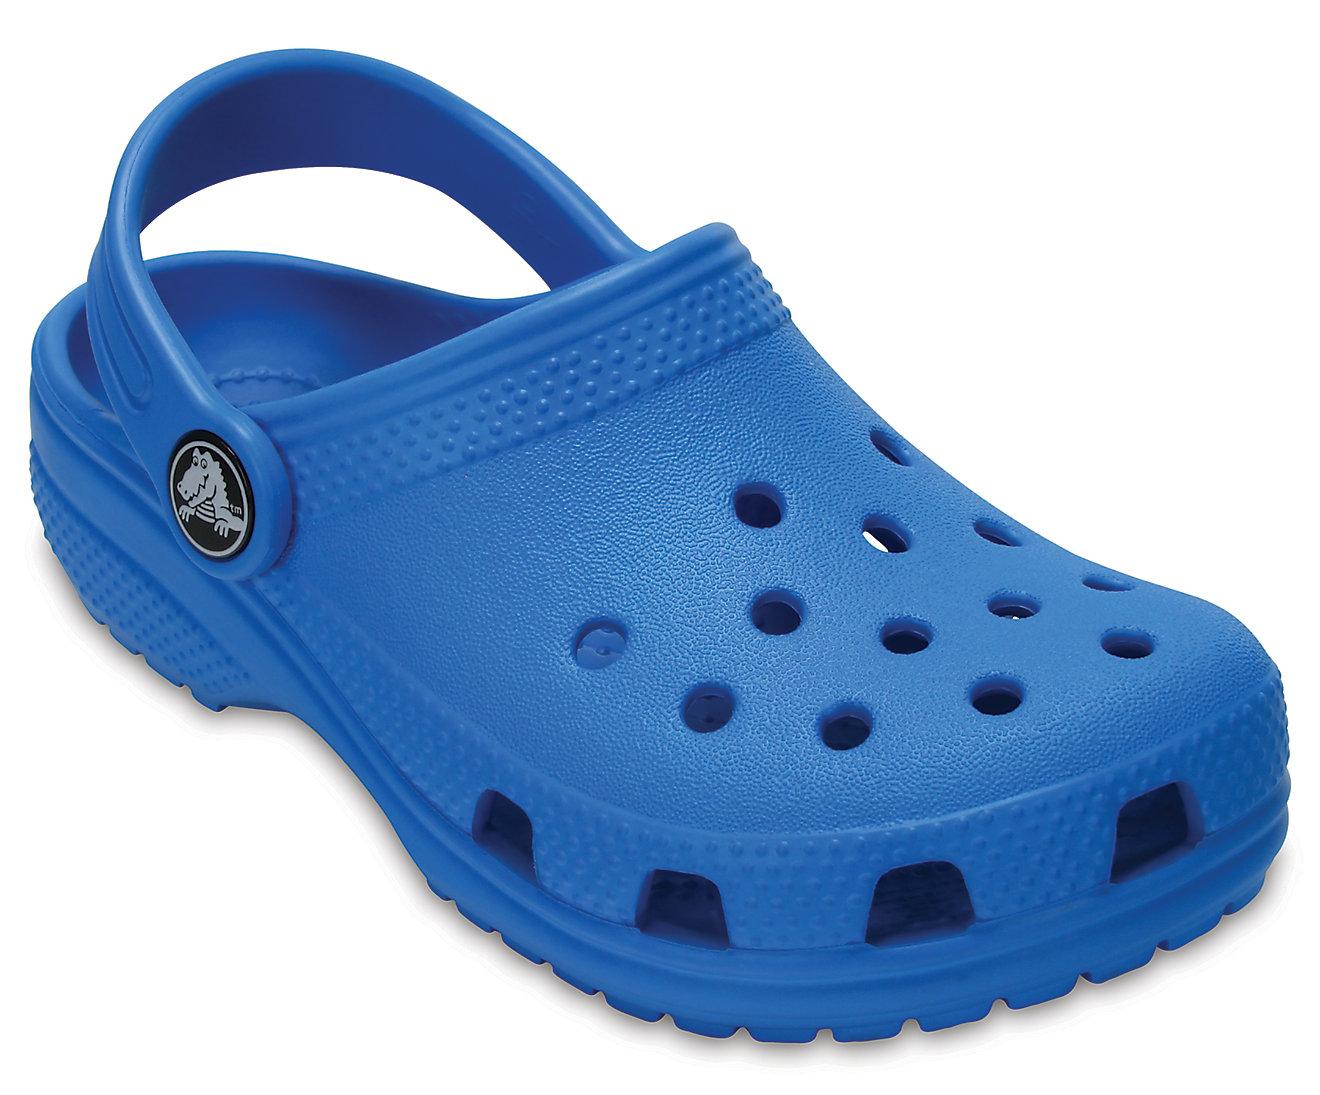 Sabots Classic Kids Ocean - Crocs YLak4dVn1